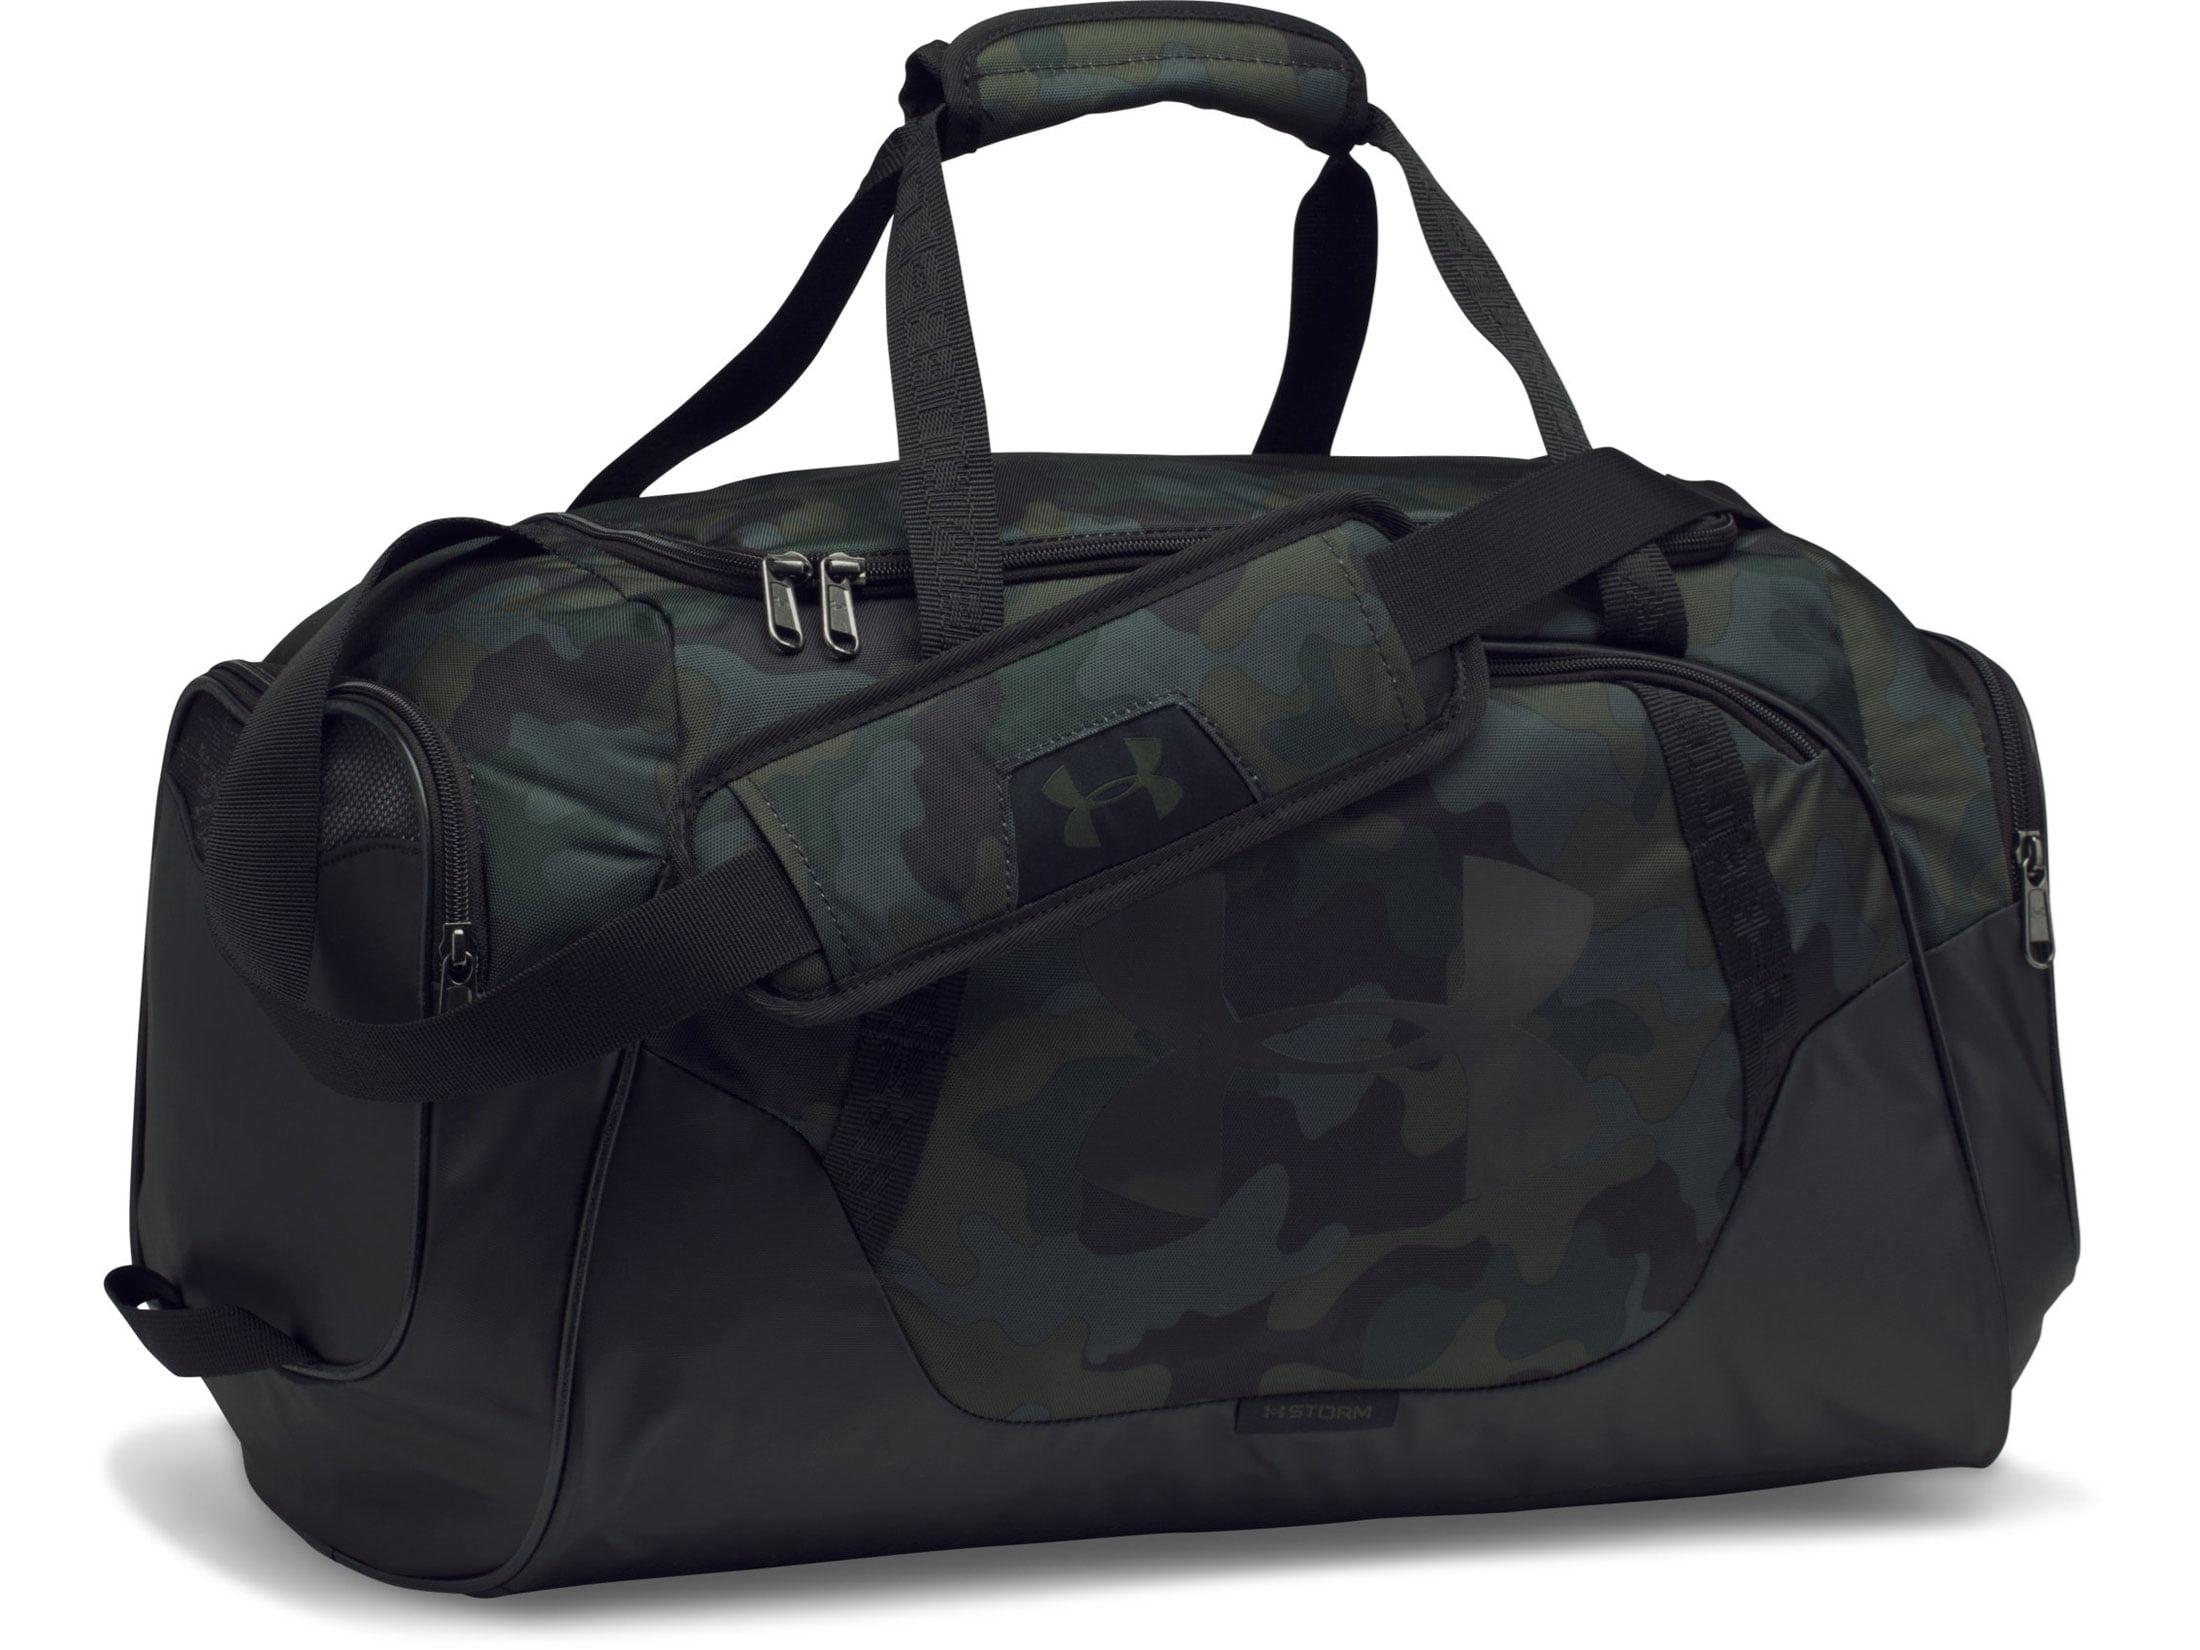 Under Armour UA Undeniable 3.0 Small Duffle Bag Desert Sand Black by Under Armour